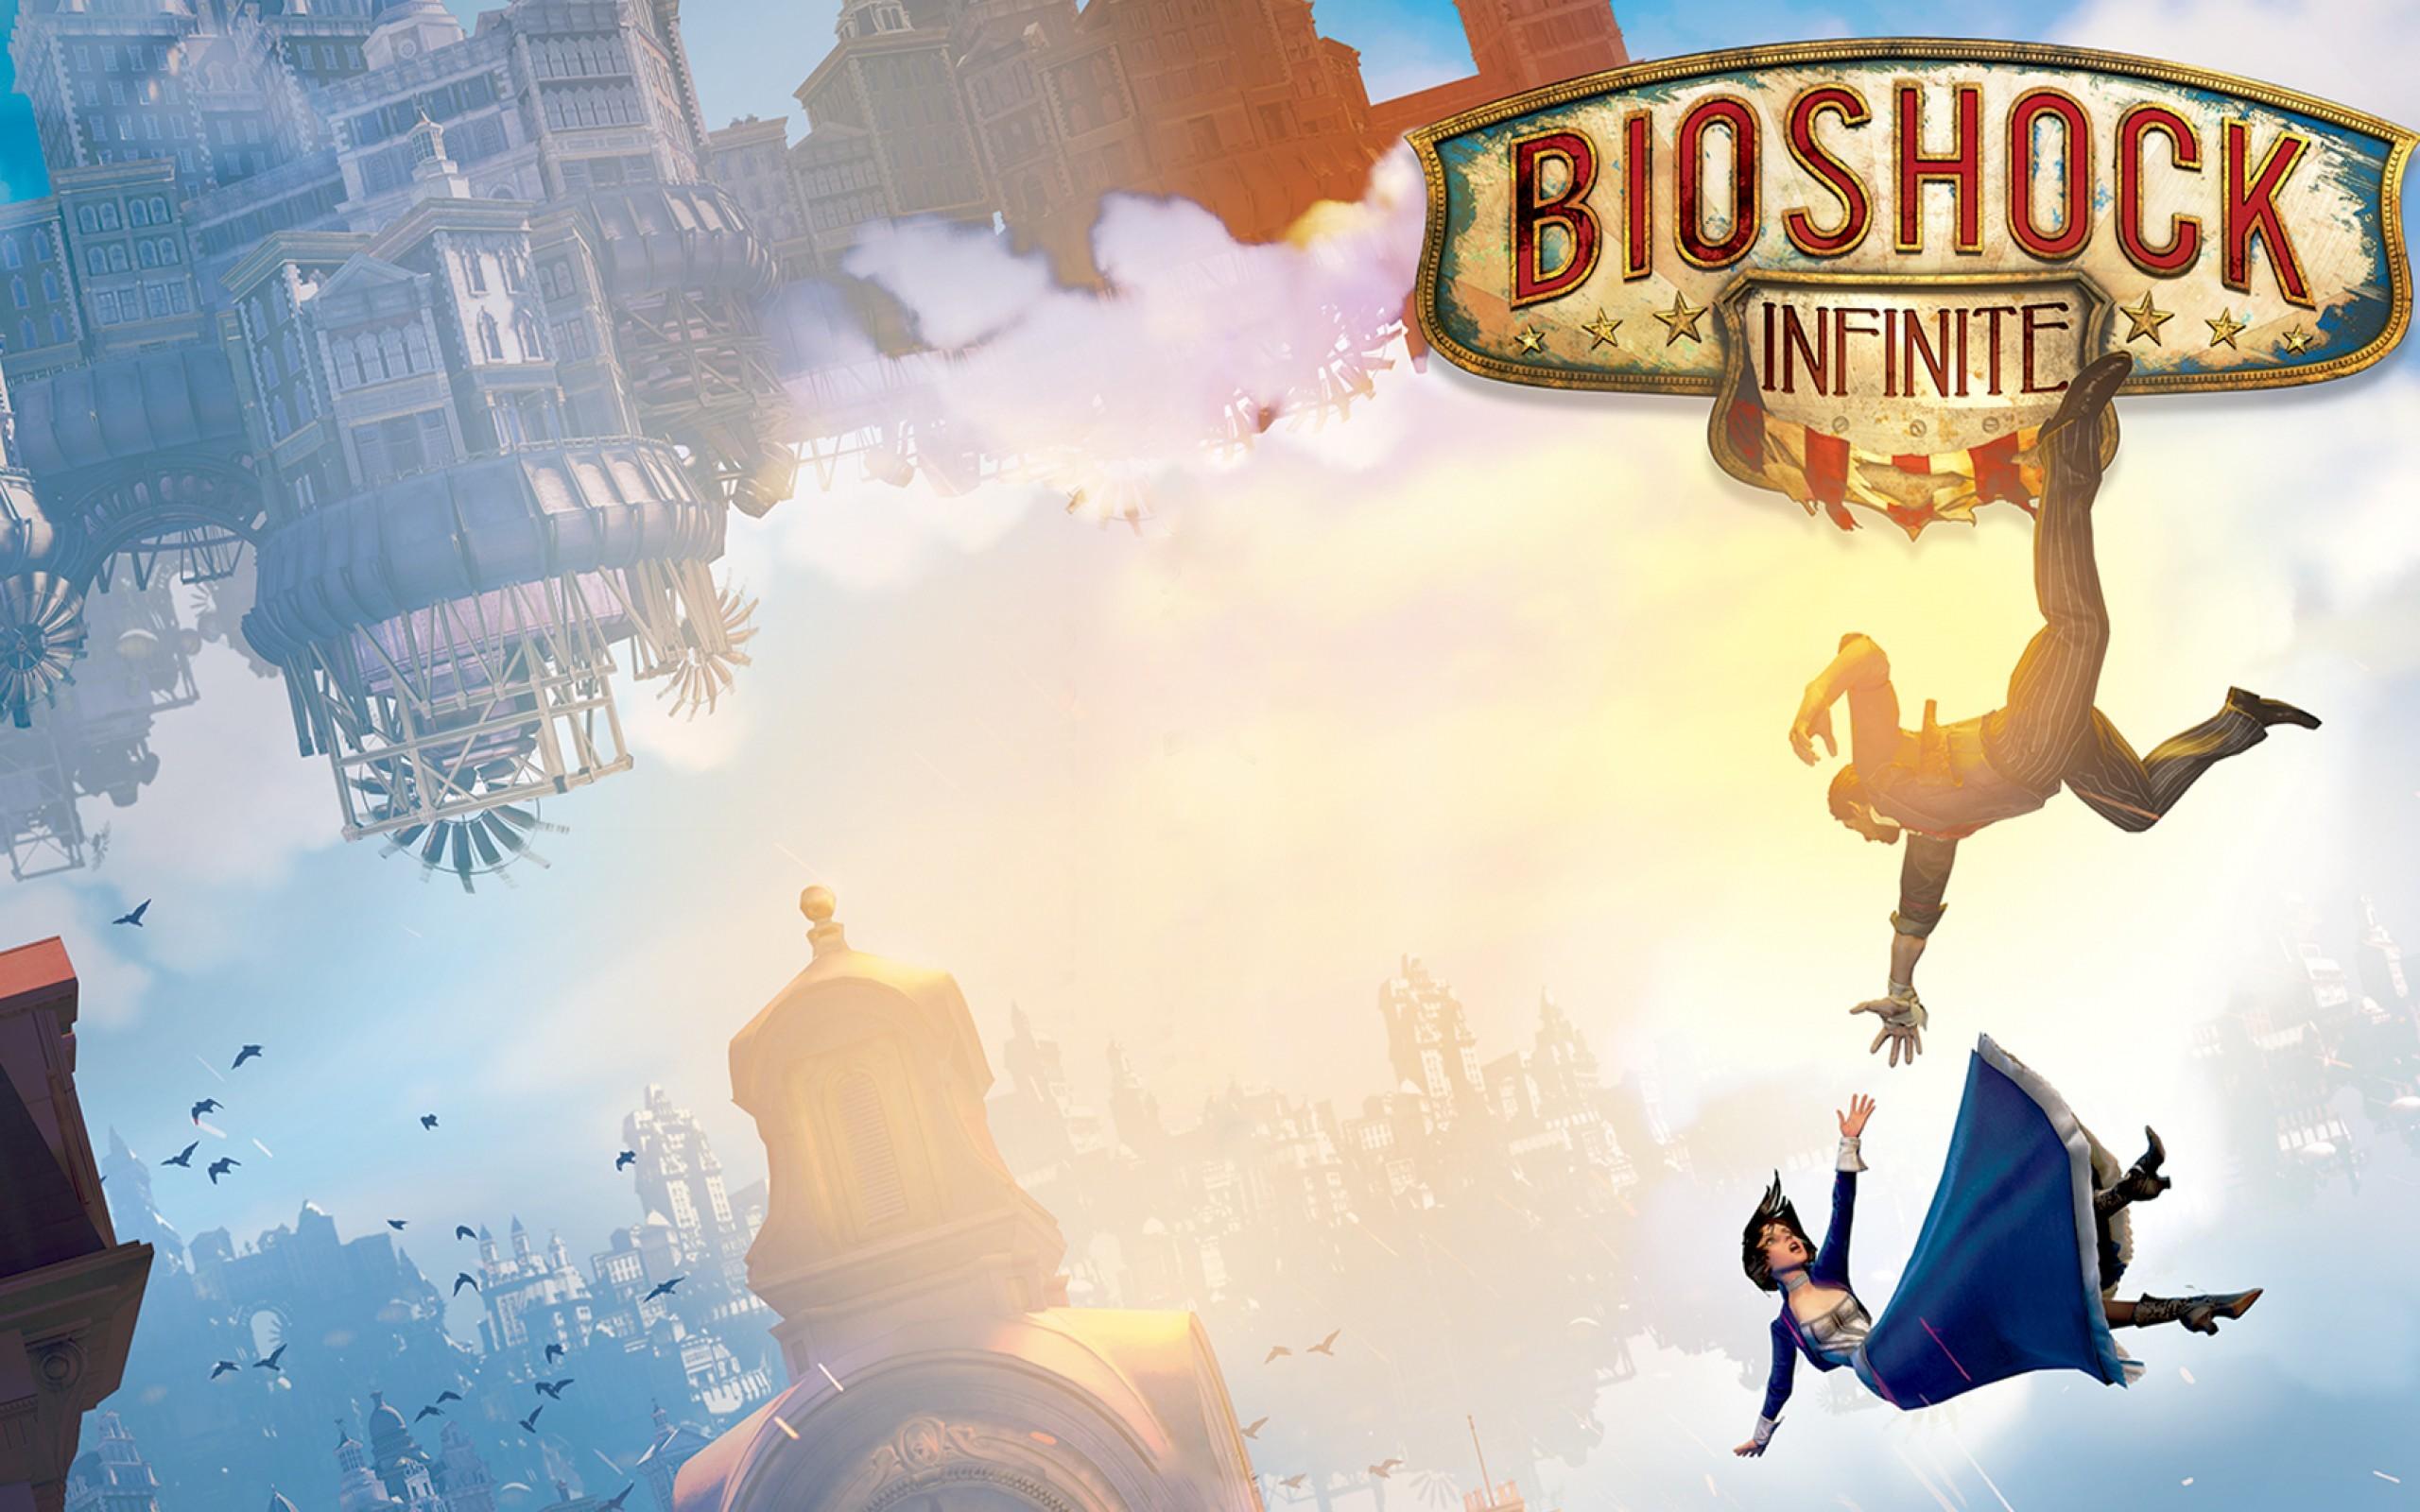 Download Wallpaper x Bioshock infinite Elizabeth Booker | HD Wallpapers |  Pinterest | Bioshock, BioShock Infinite and Hd wallpaper